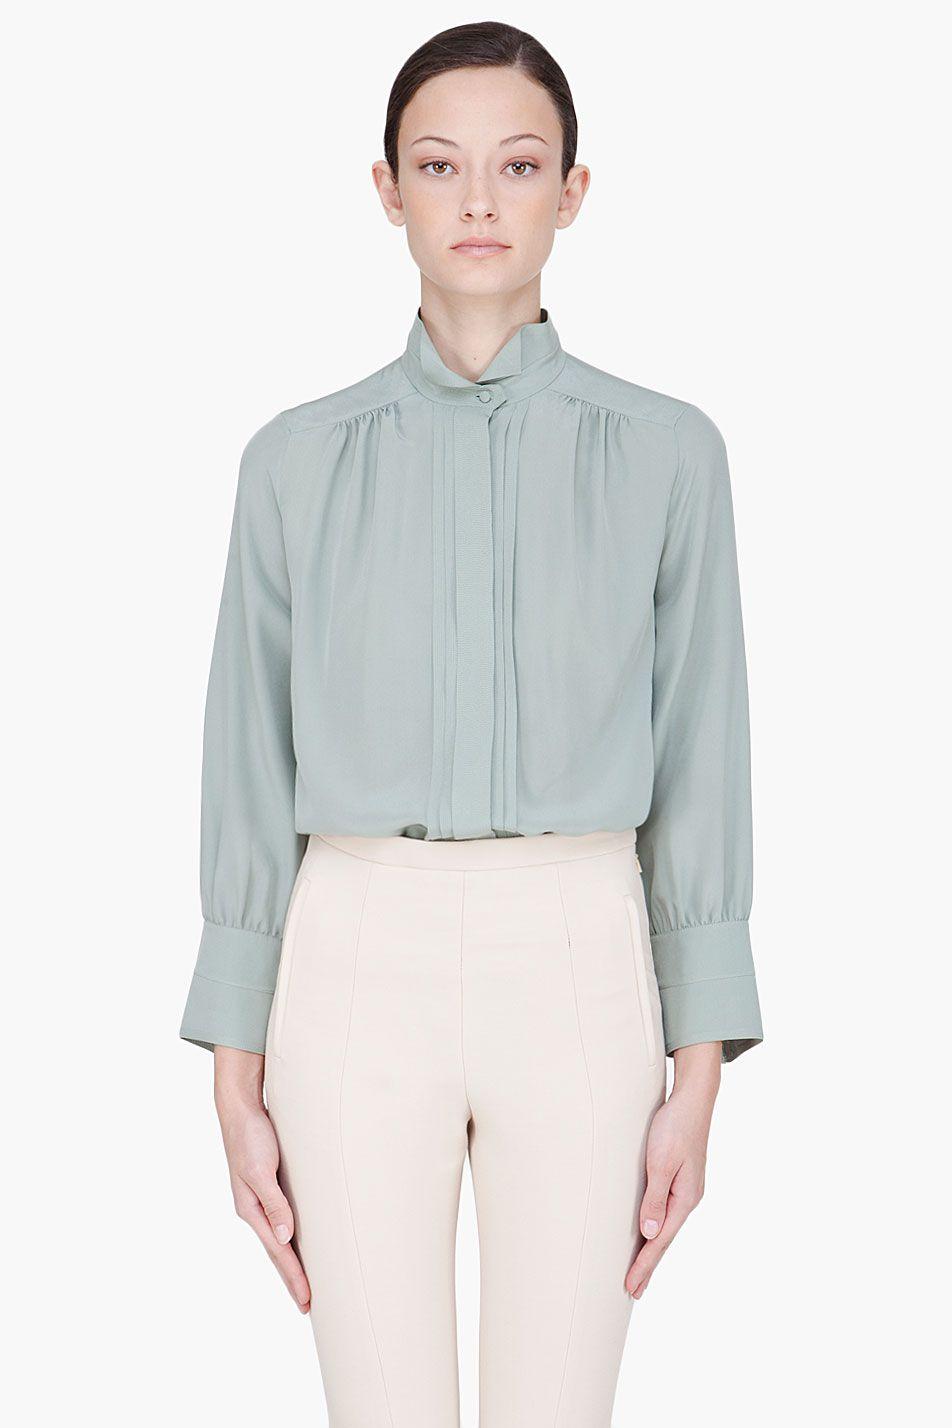 d40d4e9385519 CHLOE Seafoam Green Silk Blouse